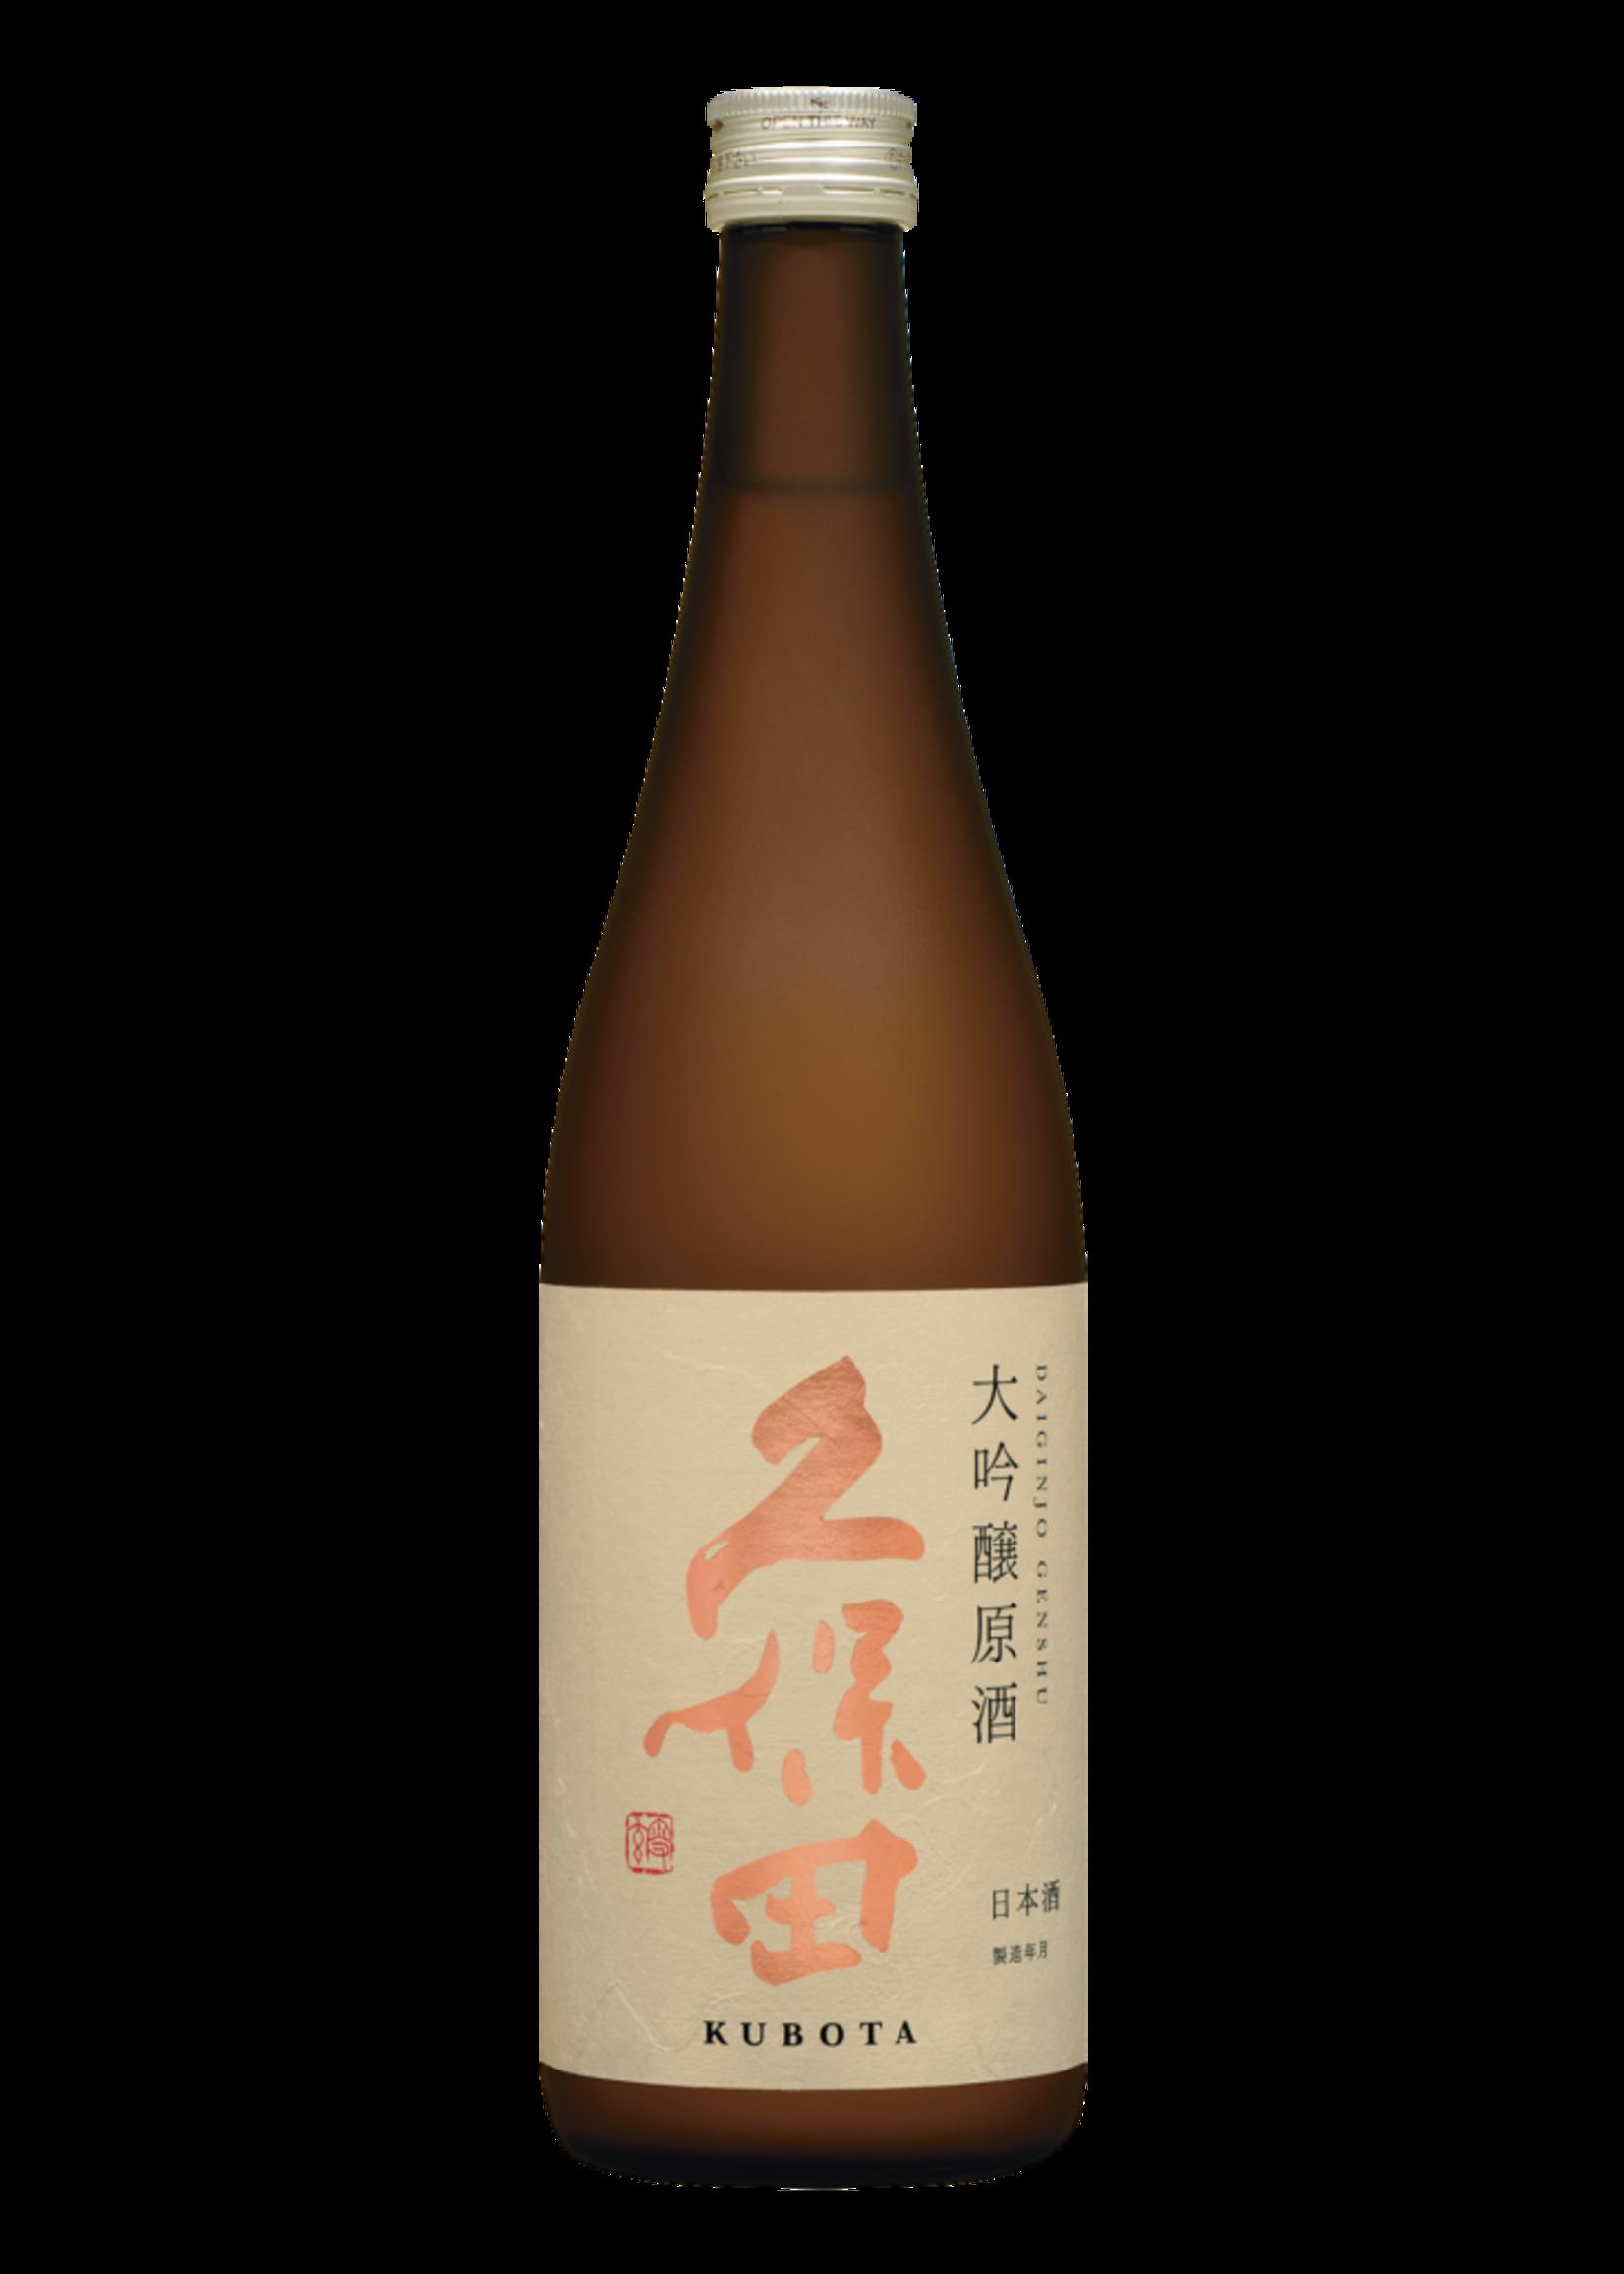 Asahi Shuzo (Niigata) Asahi Shuzo (Niigata) Kubota / Daiginjo Genshu / 720mL